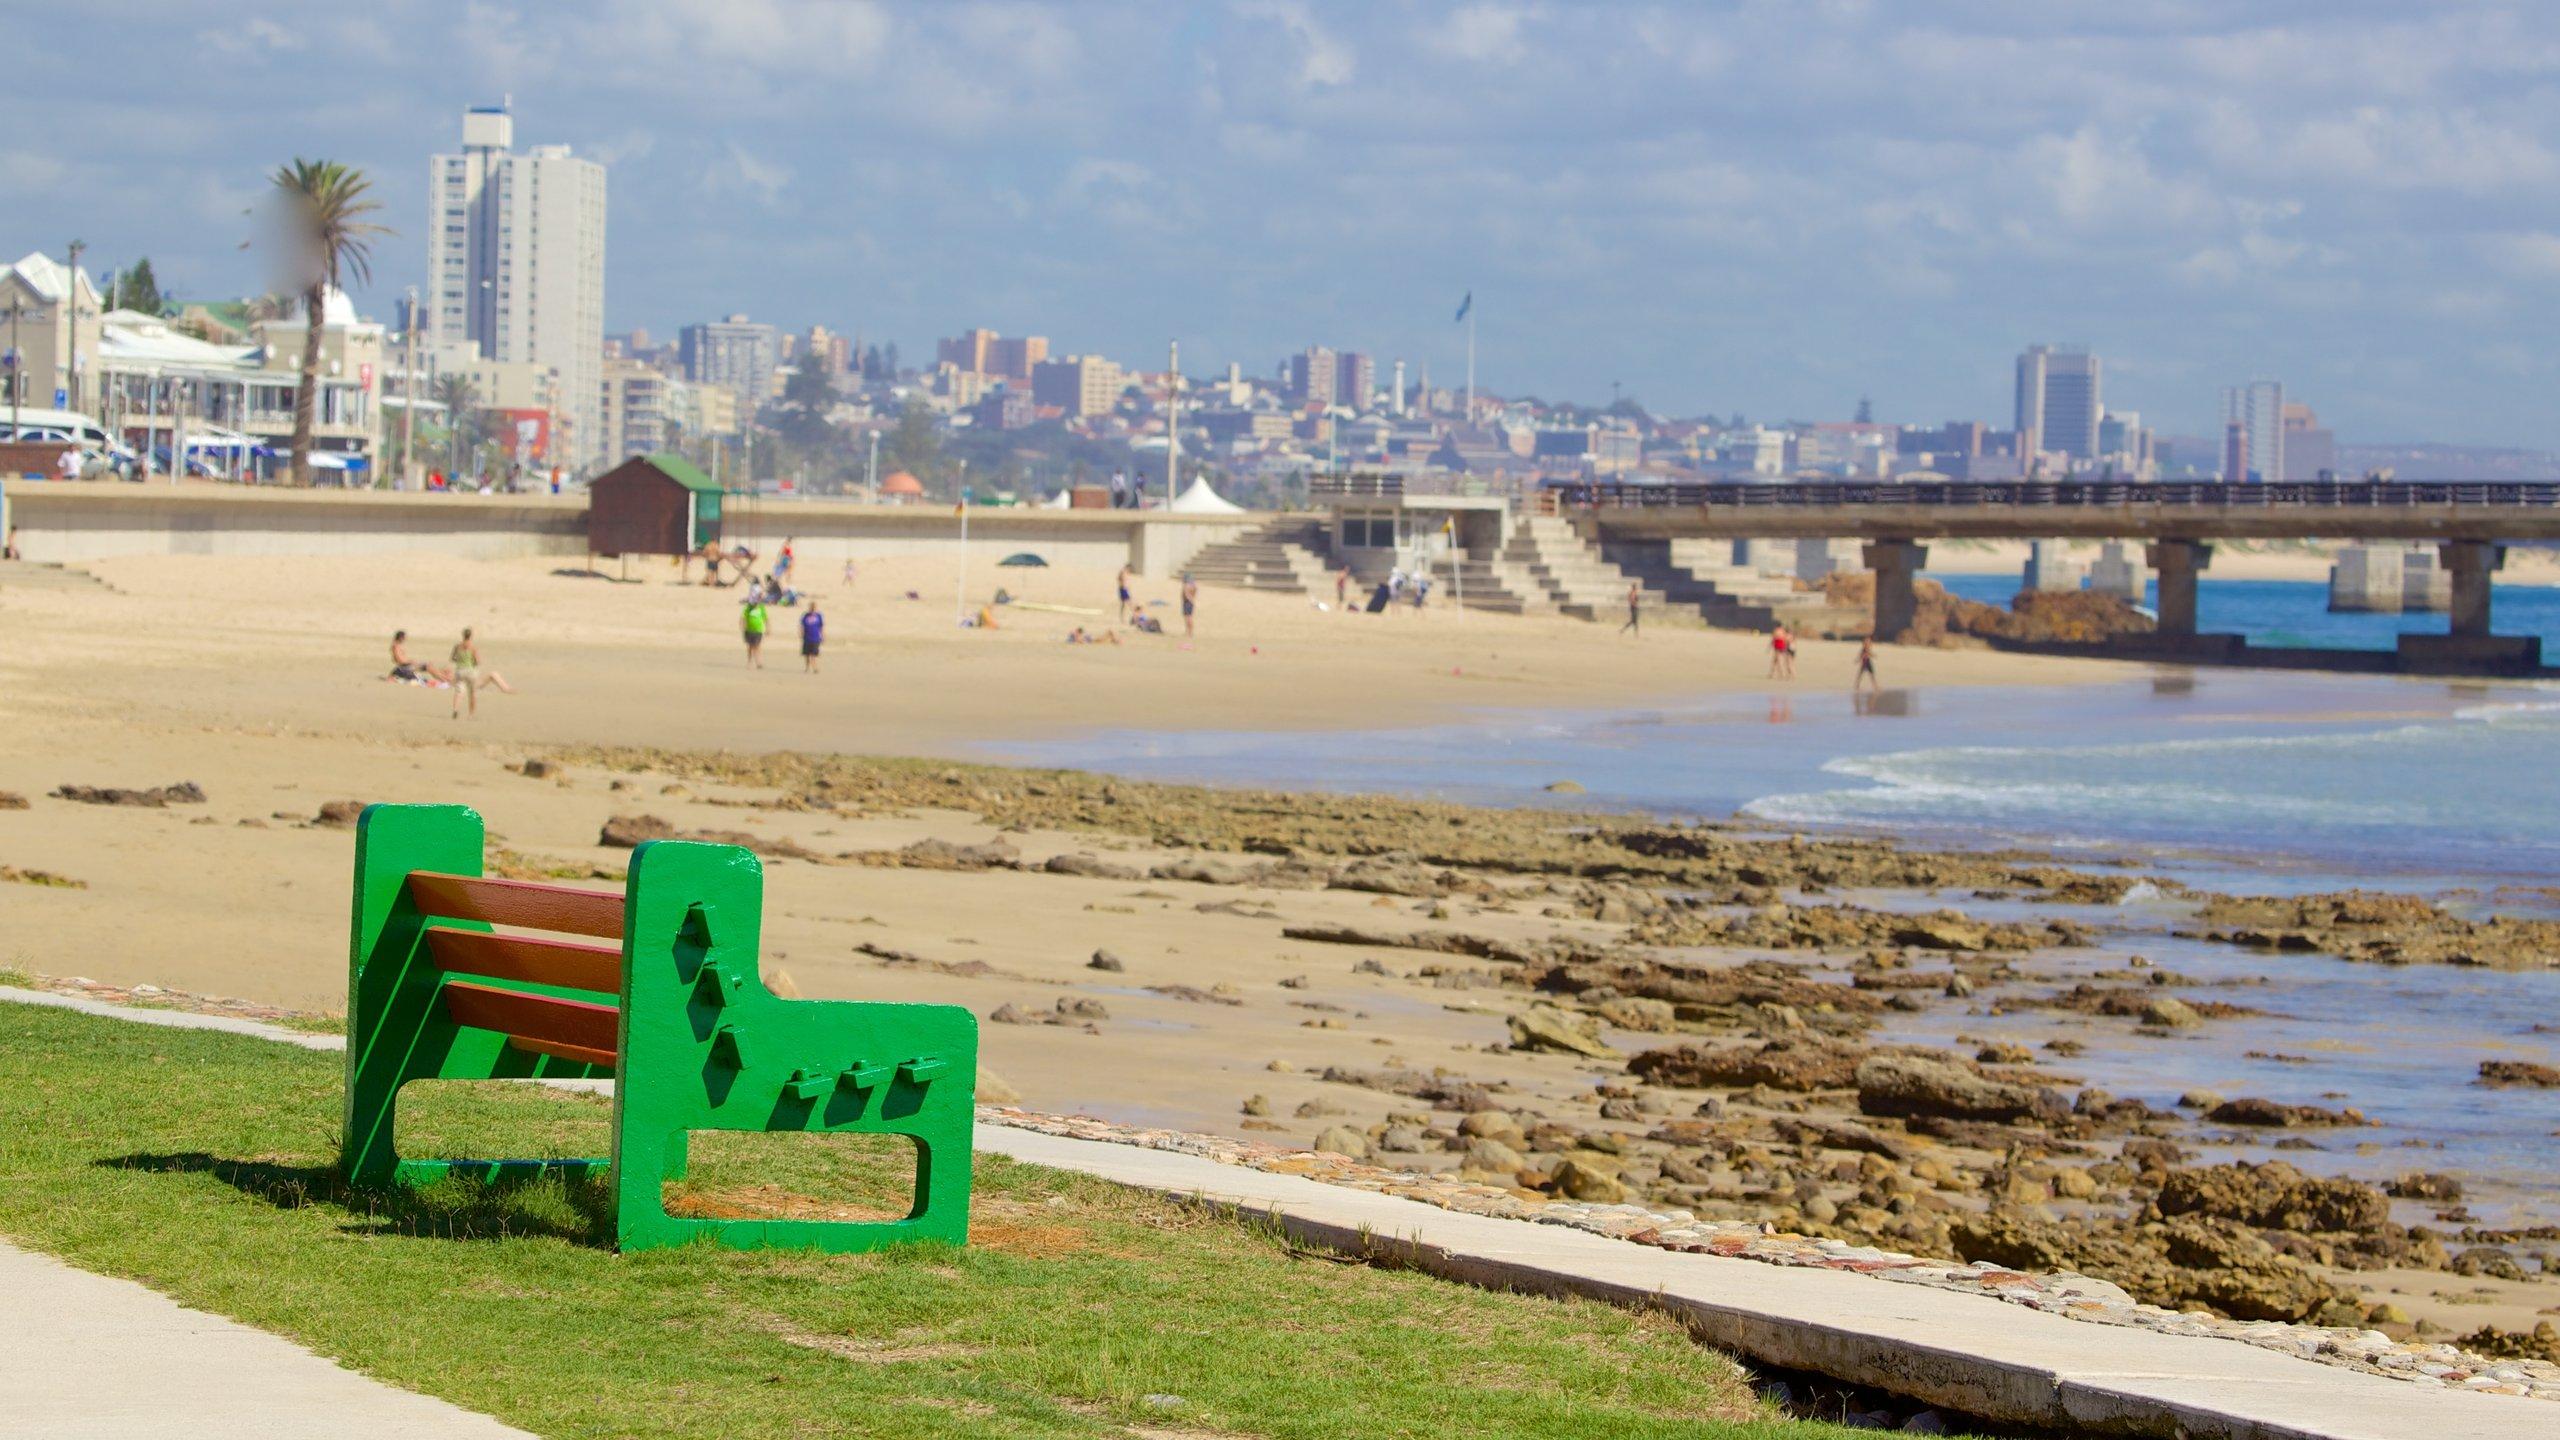 Port Elizabeth, Eastern Cape, South Africa